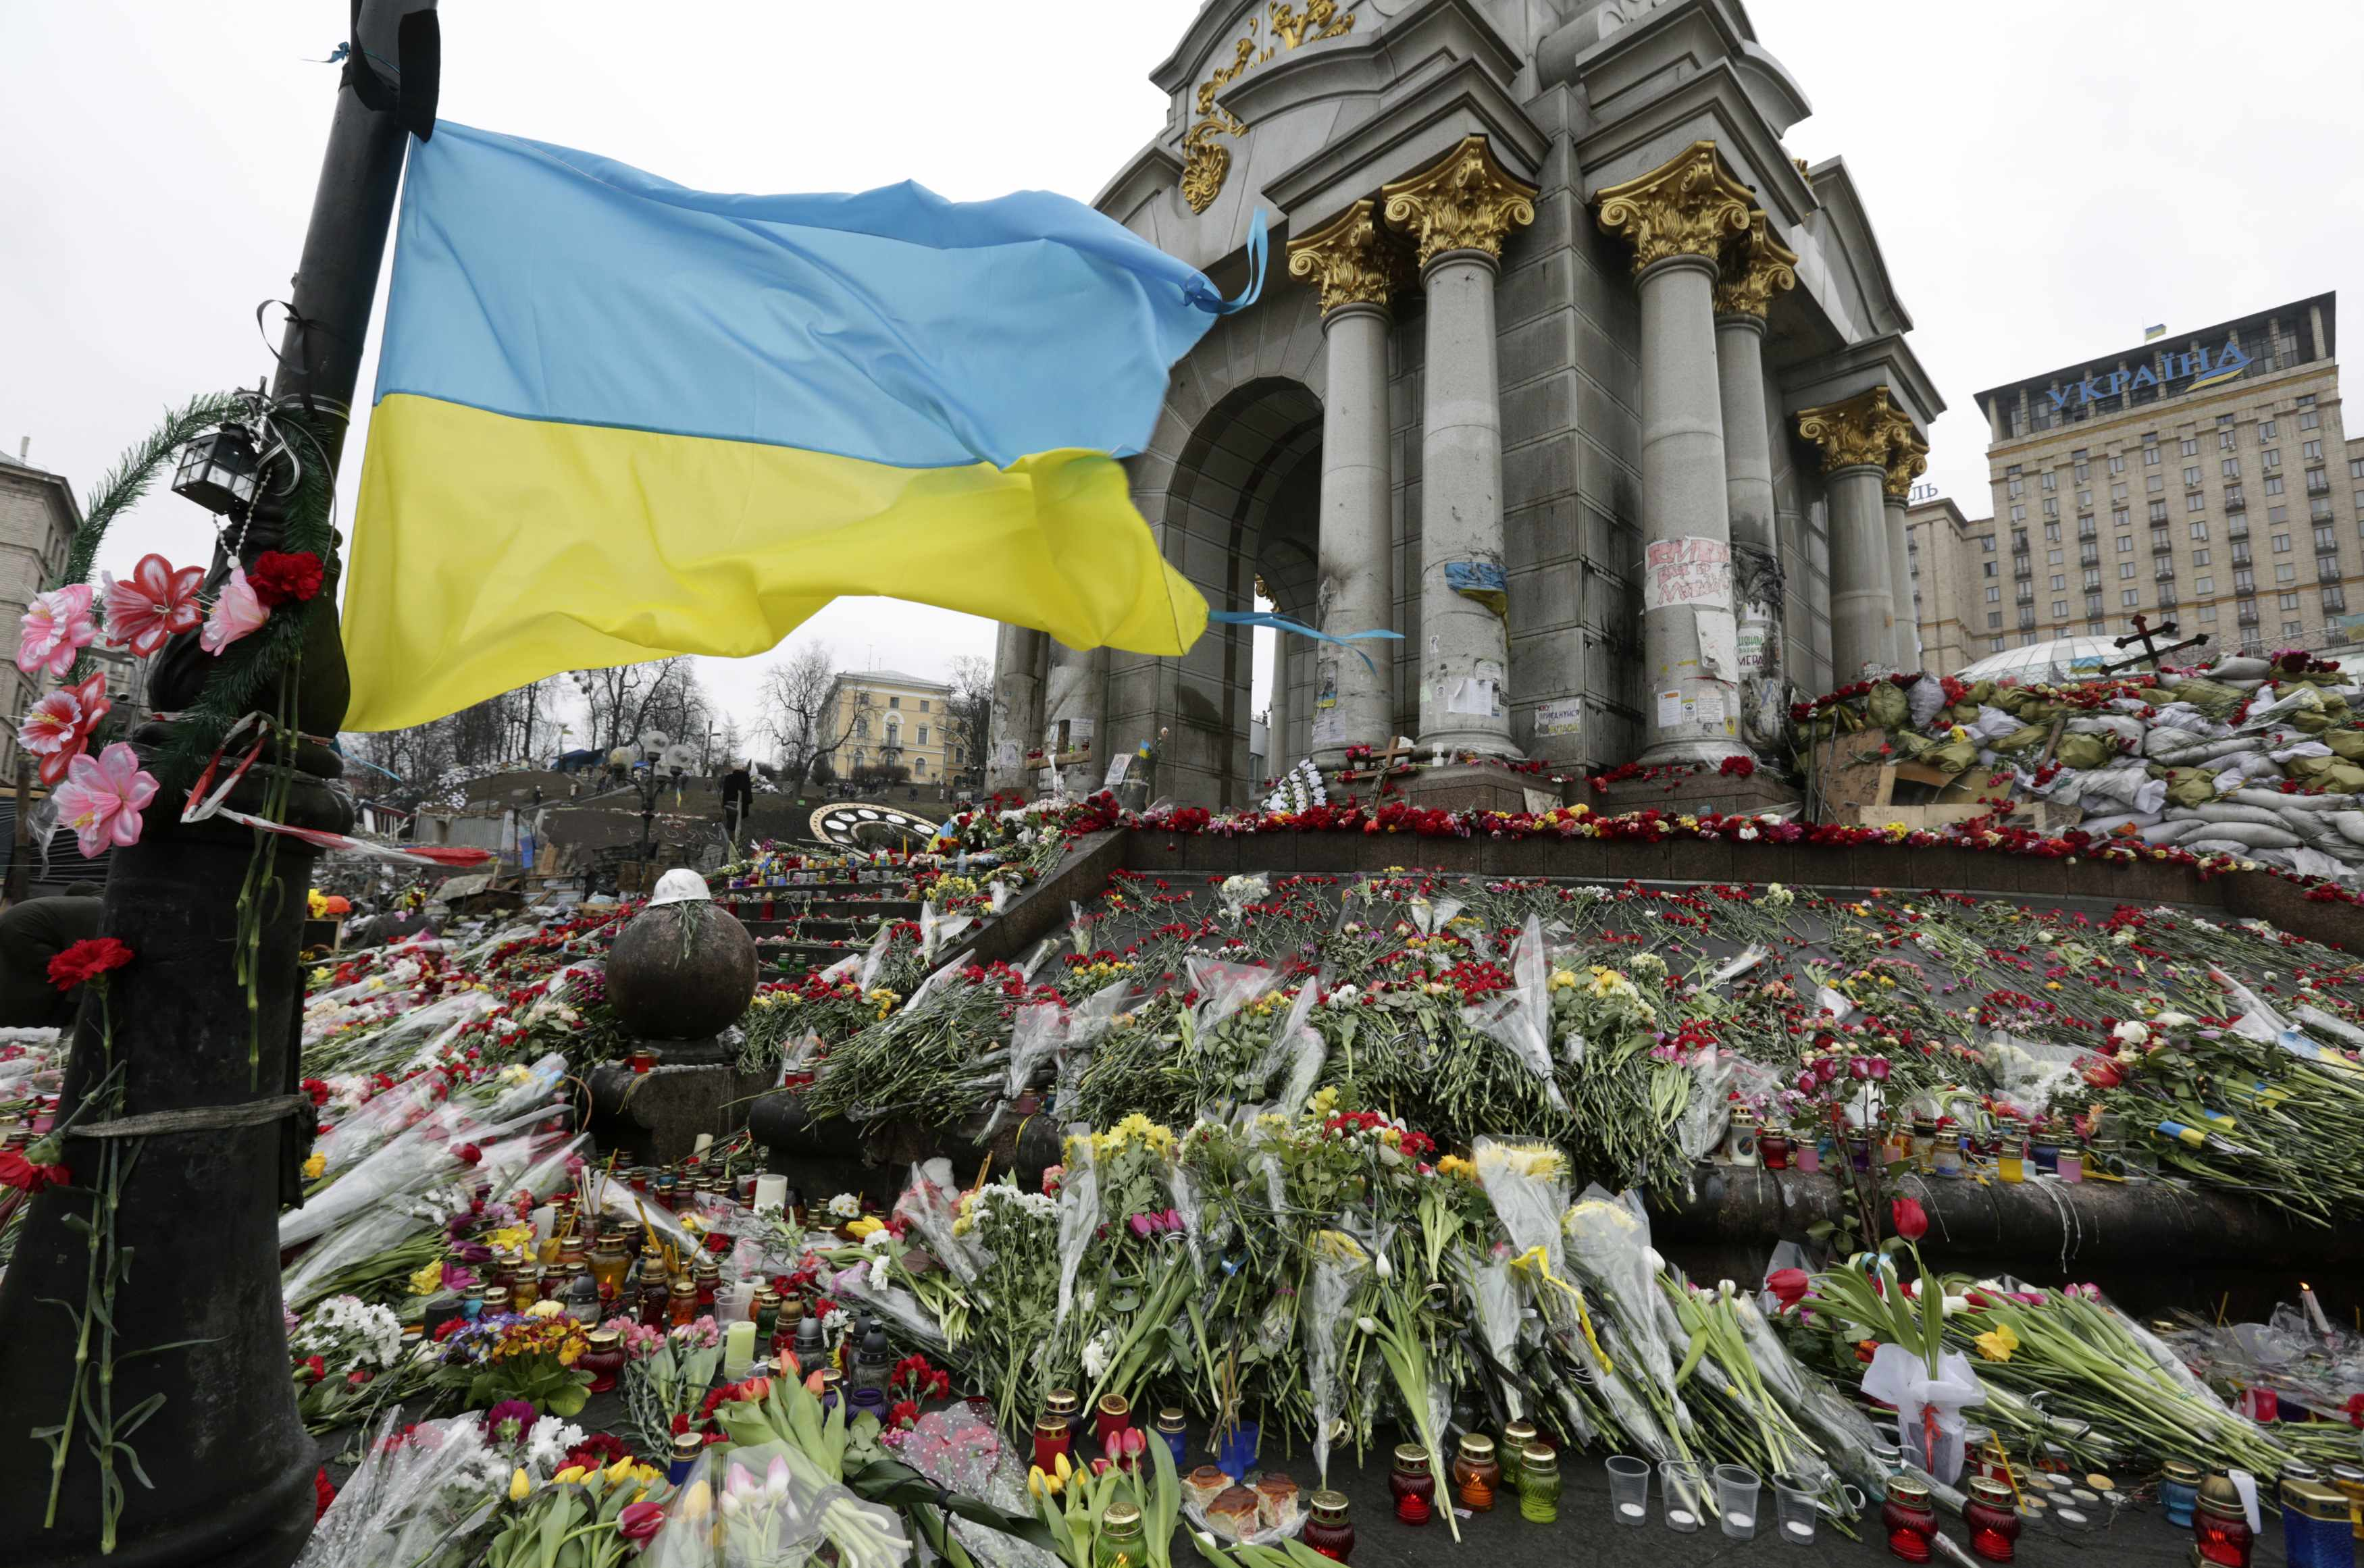 Майдан Независимости, 25 февраля 2014 года